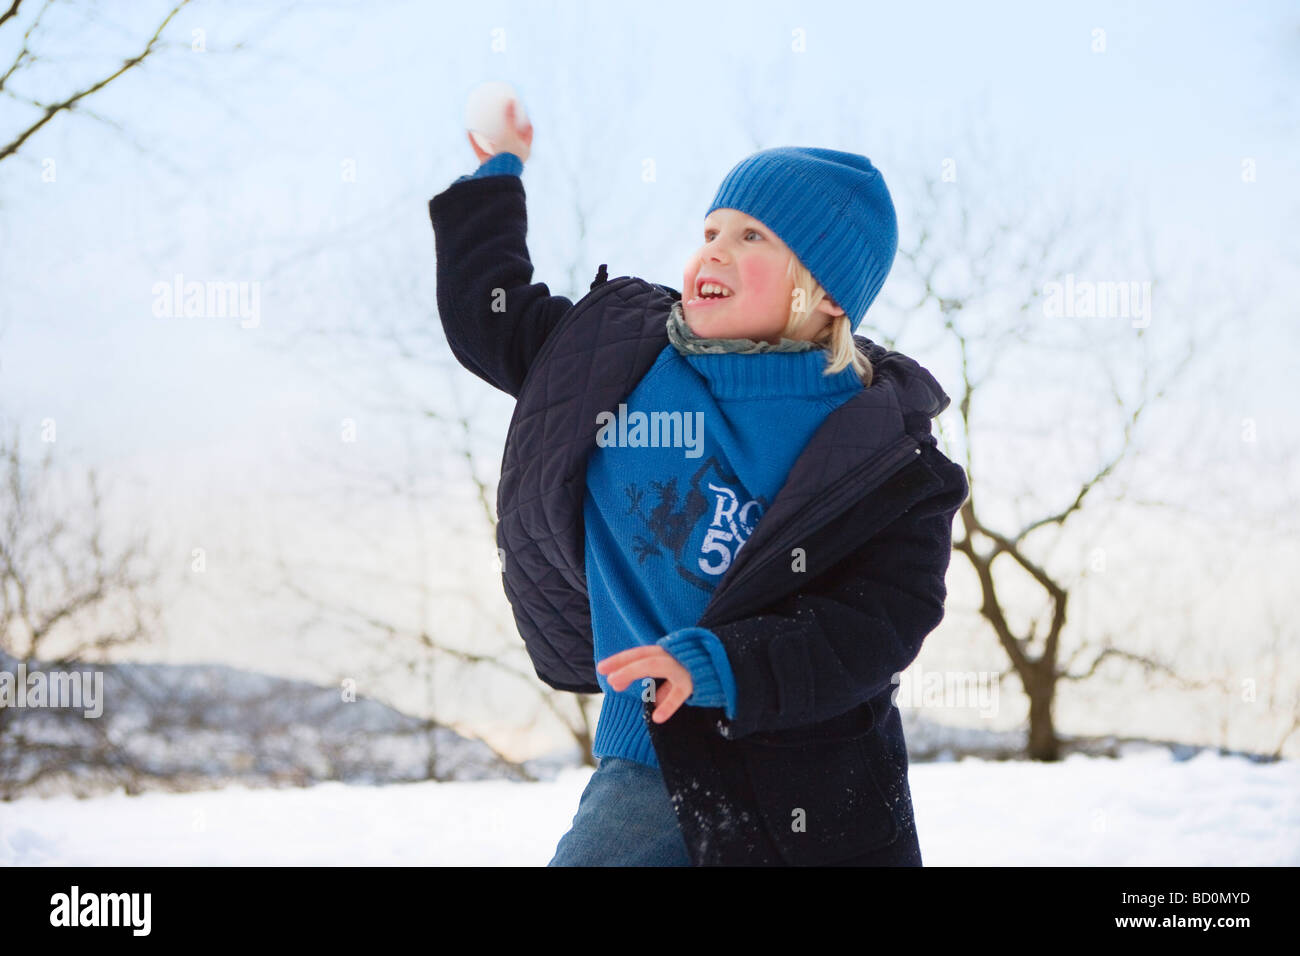 Skandinavische junge werfen Schneeball Stockbild